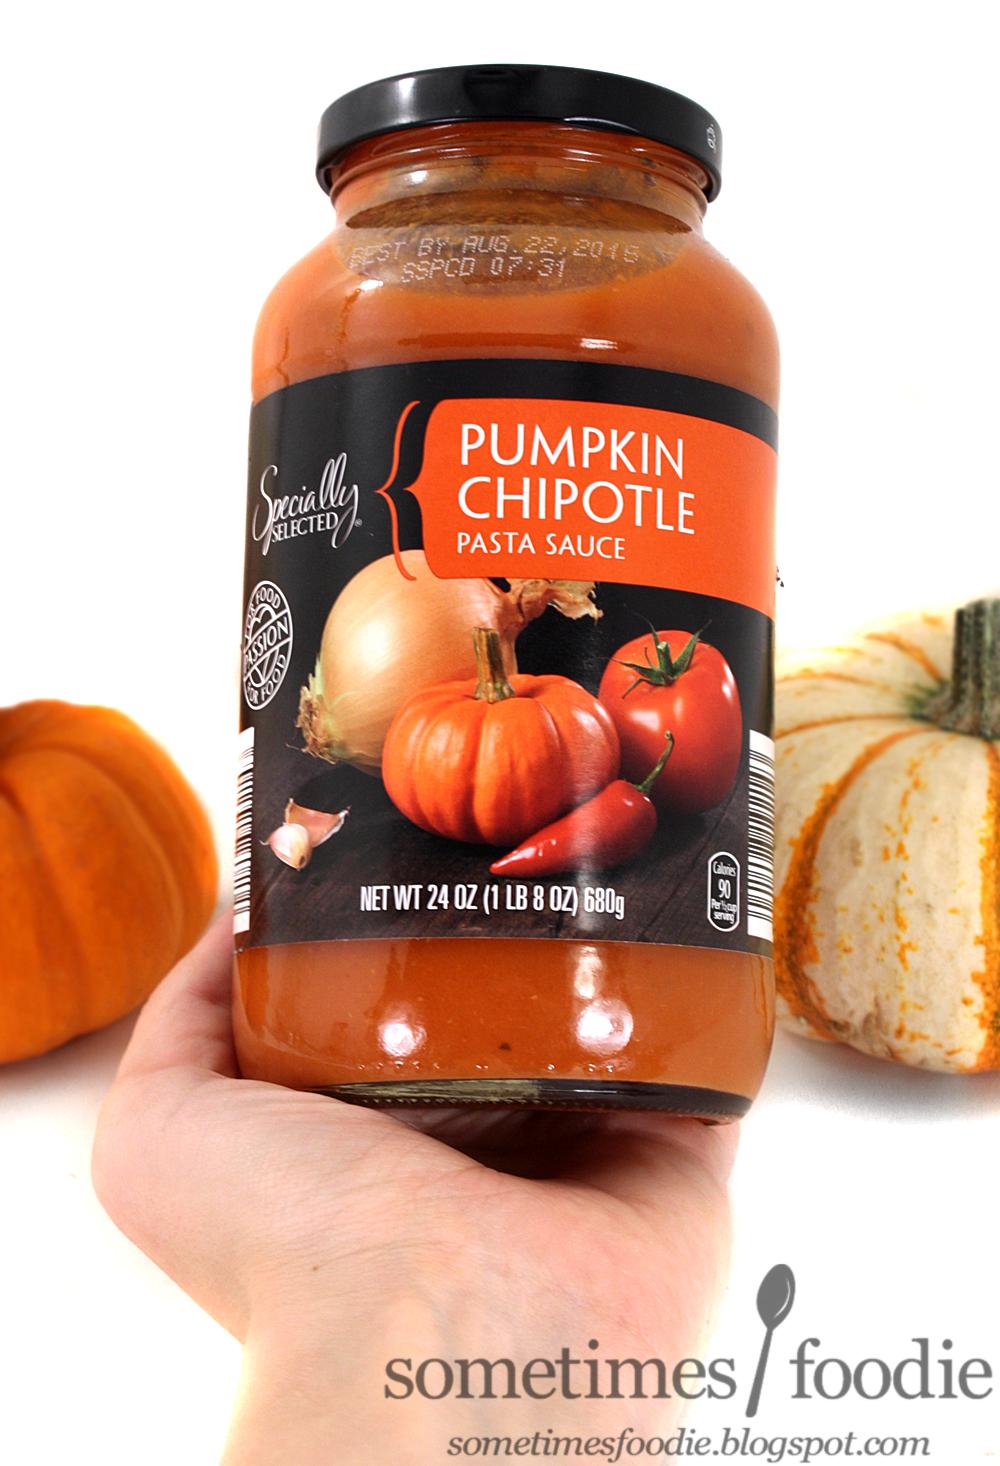 Sometimes Foodie: Pumpkin Chipotle Pasta Sauce - Aldi ...